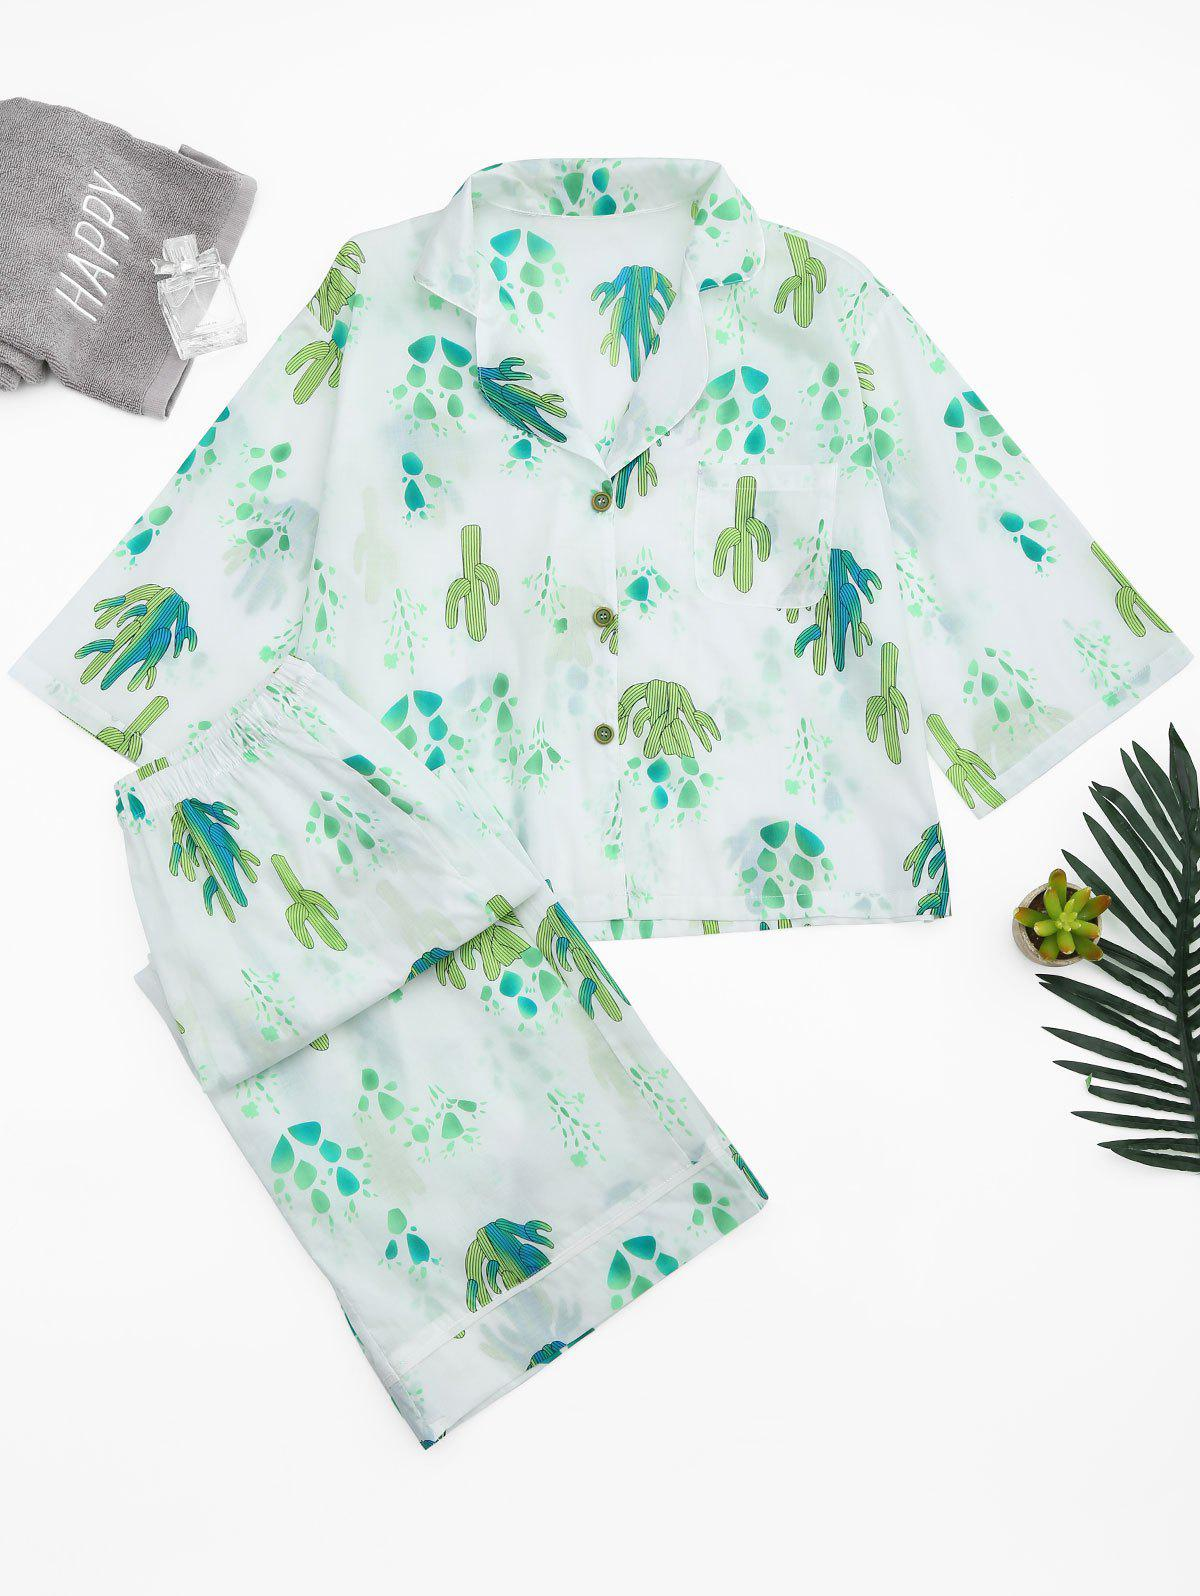 Cactus Print Shirt with Wide Leg Pants 216158103